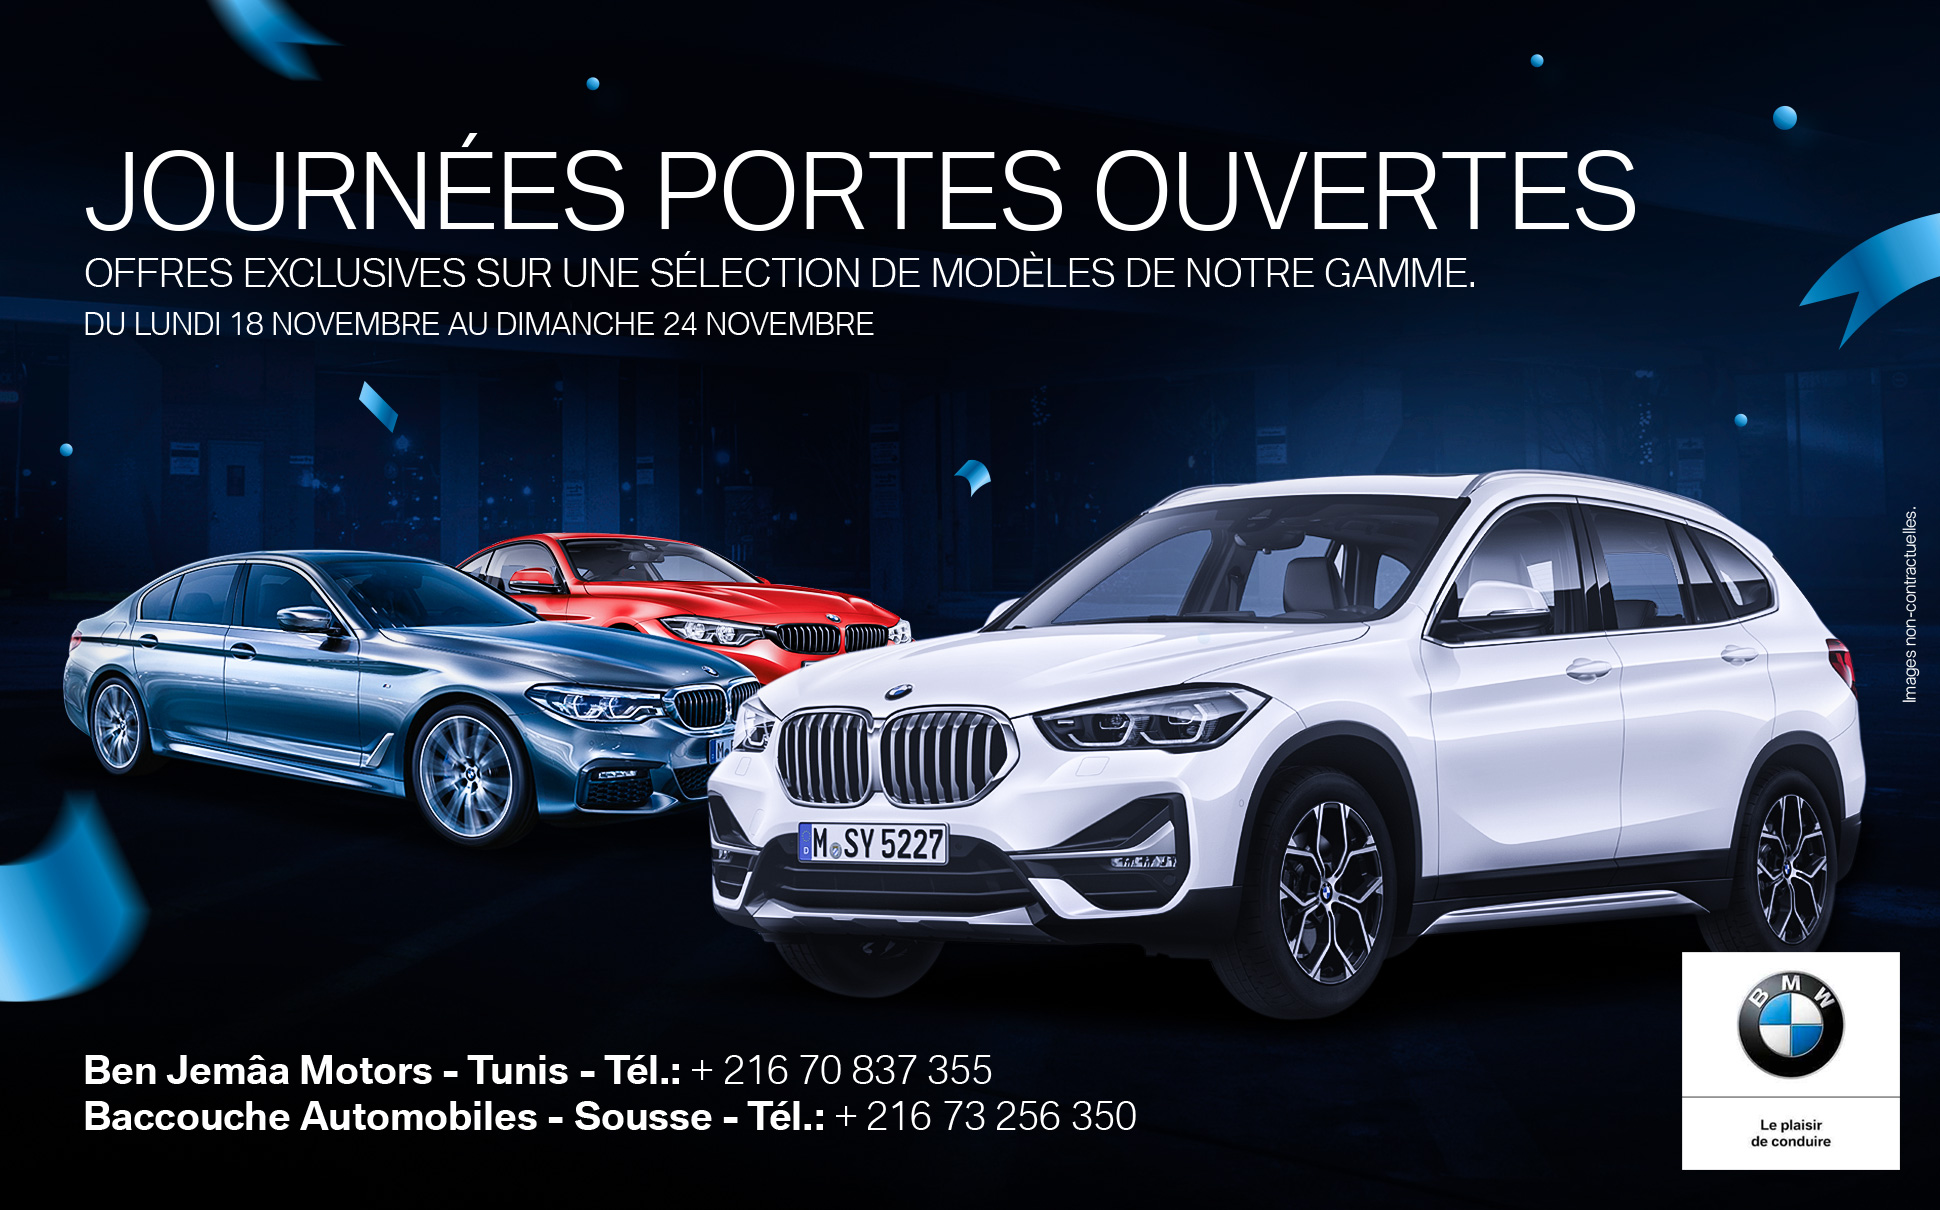 Portes ouvertes BMW